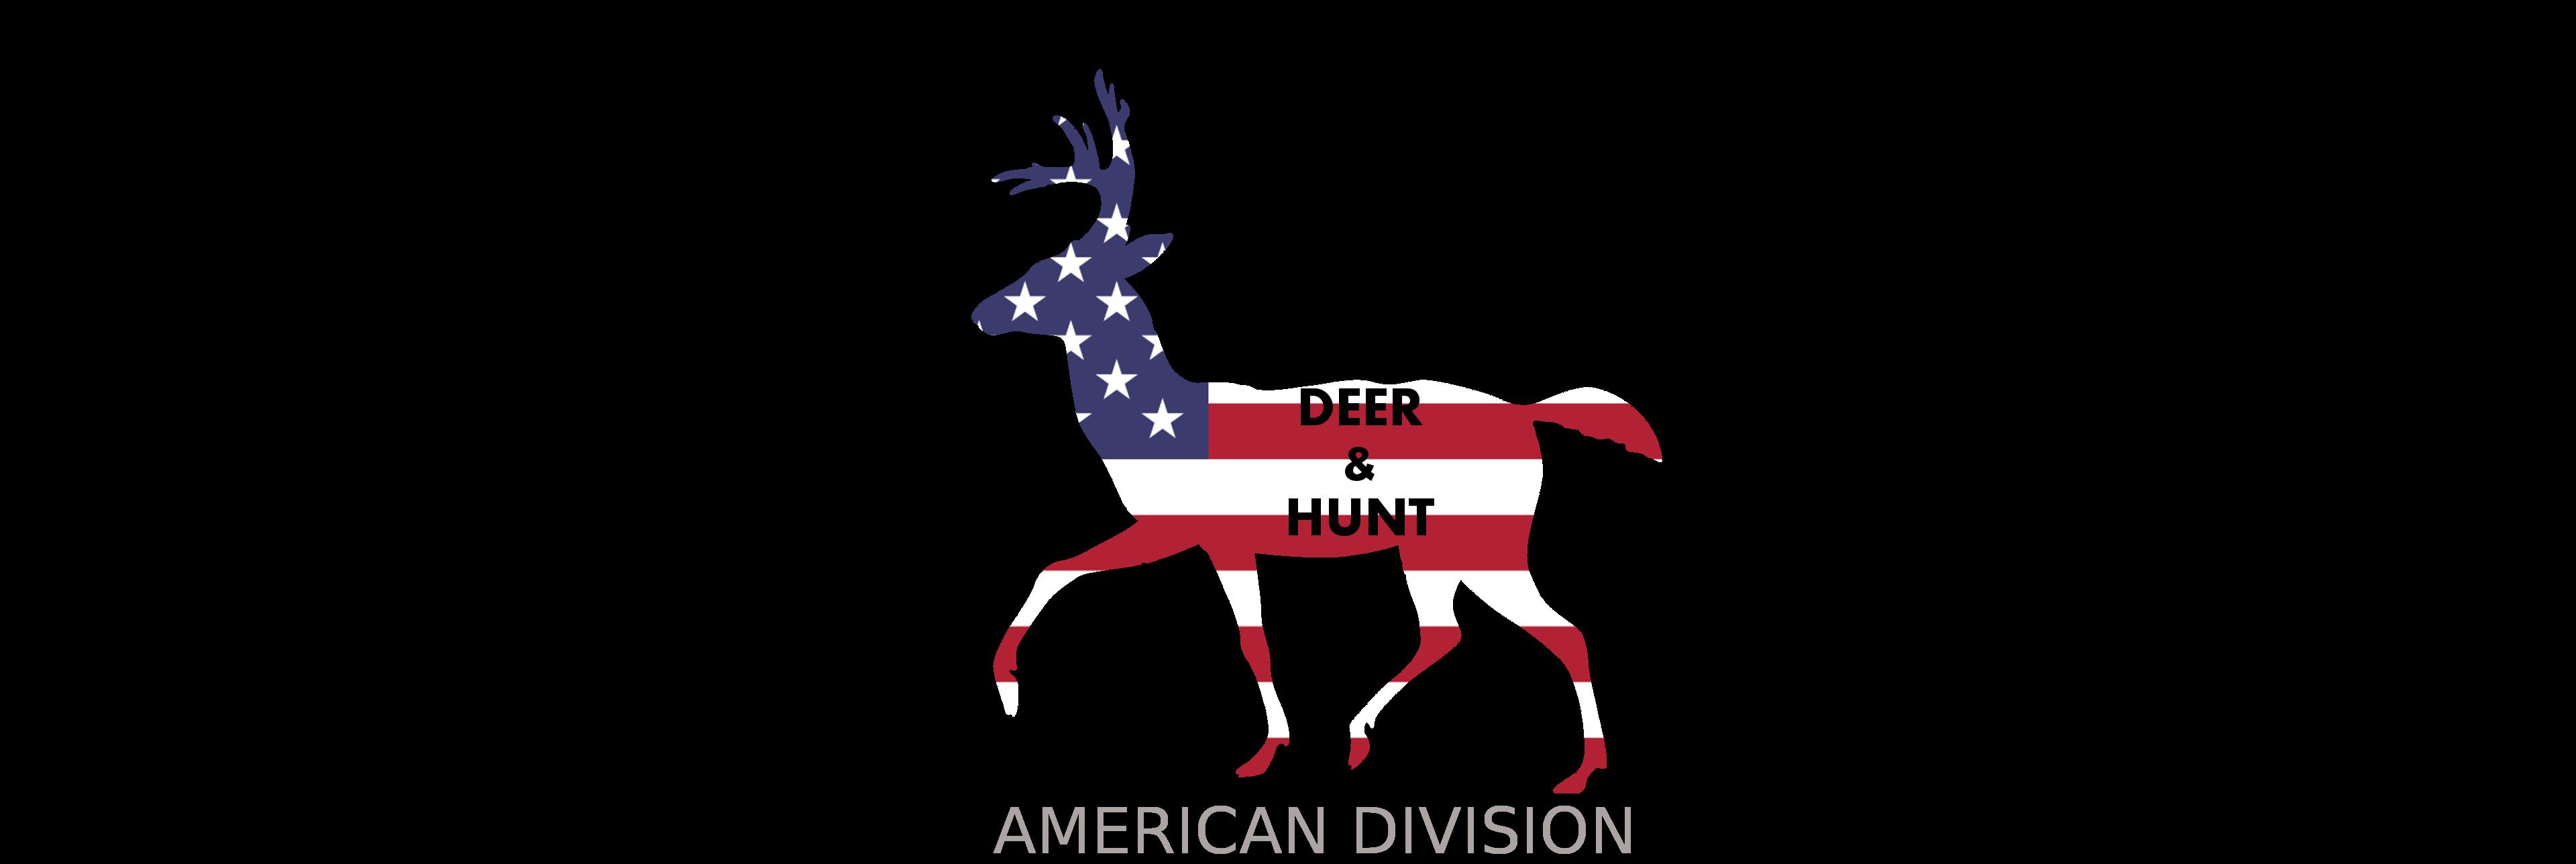 DeerAndHunt